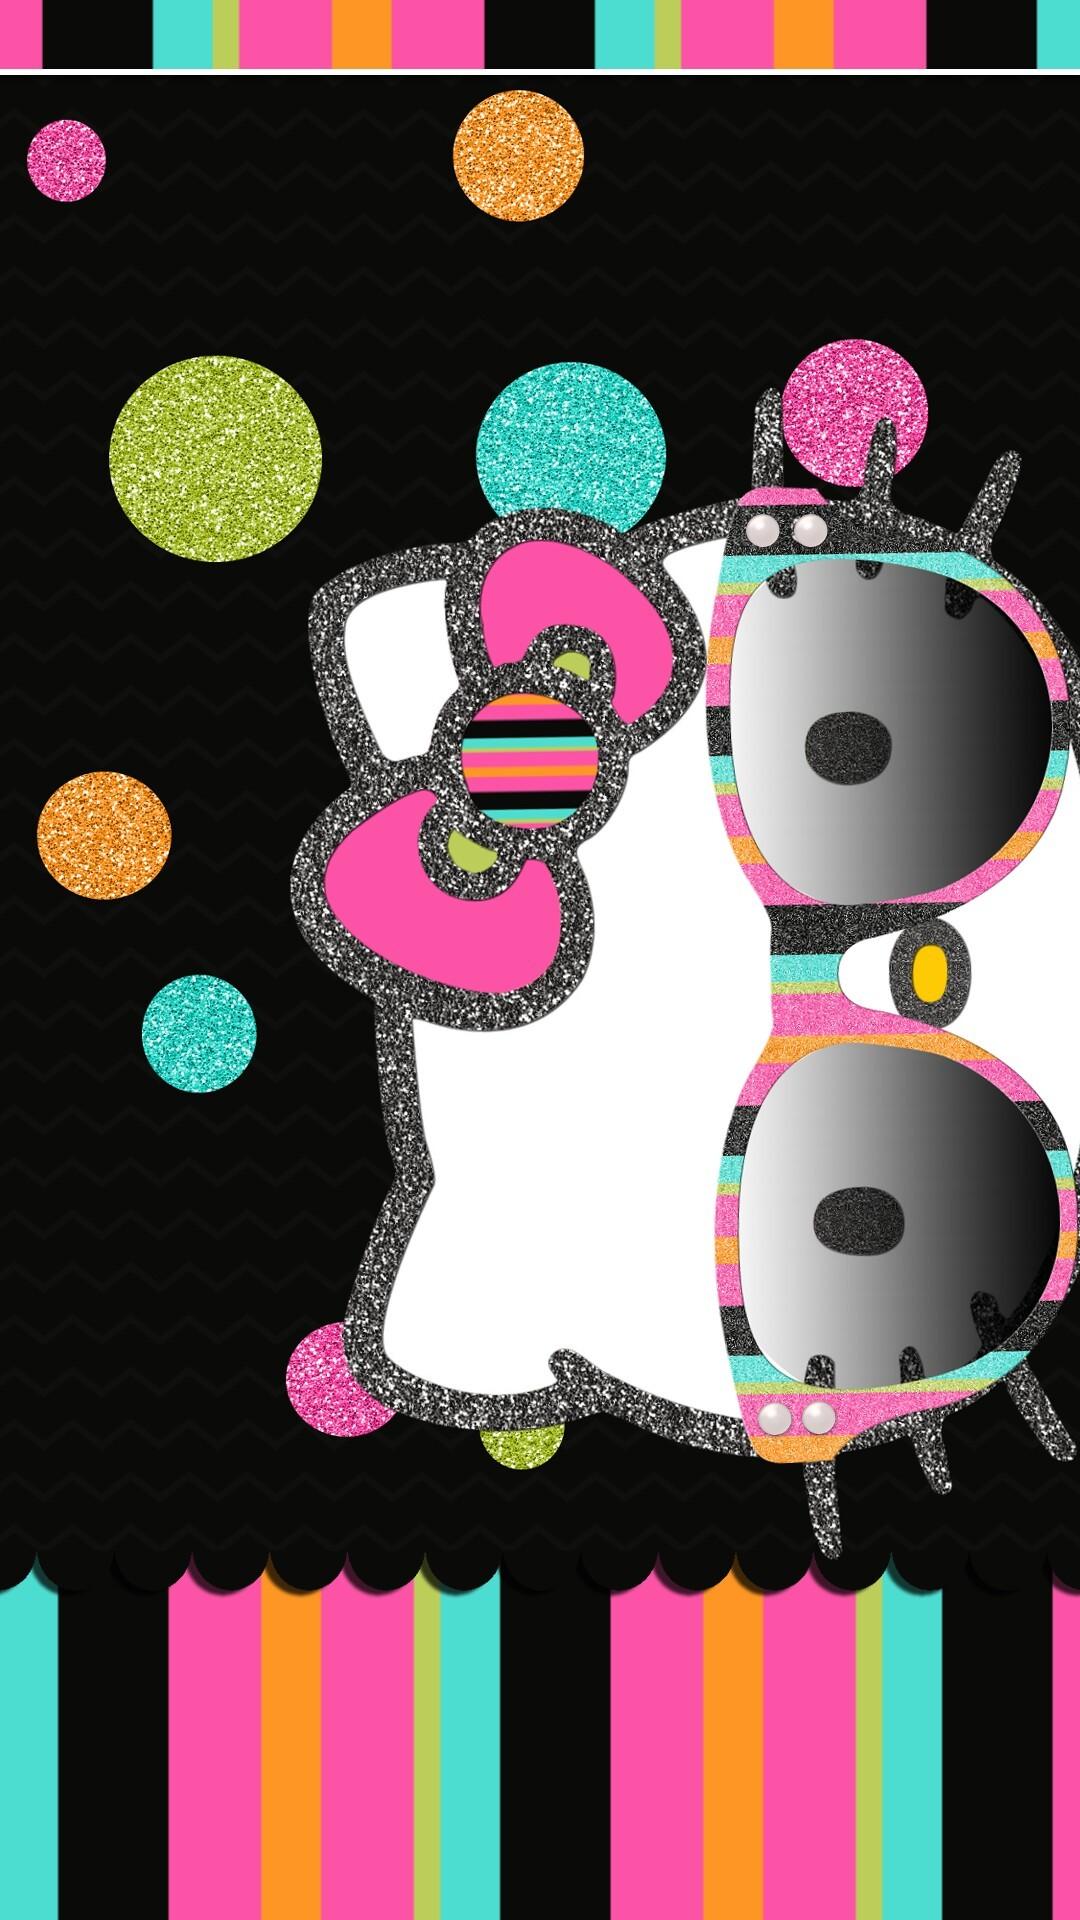 Kitty wallpaper · iPhone Wall: HK tjn